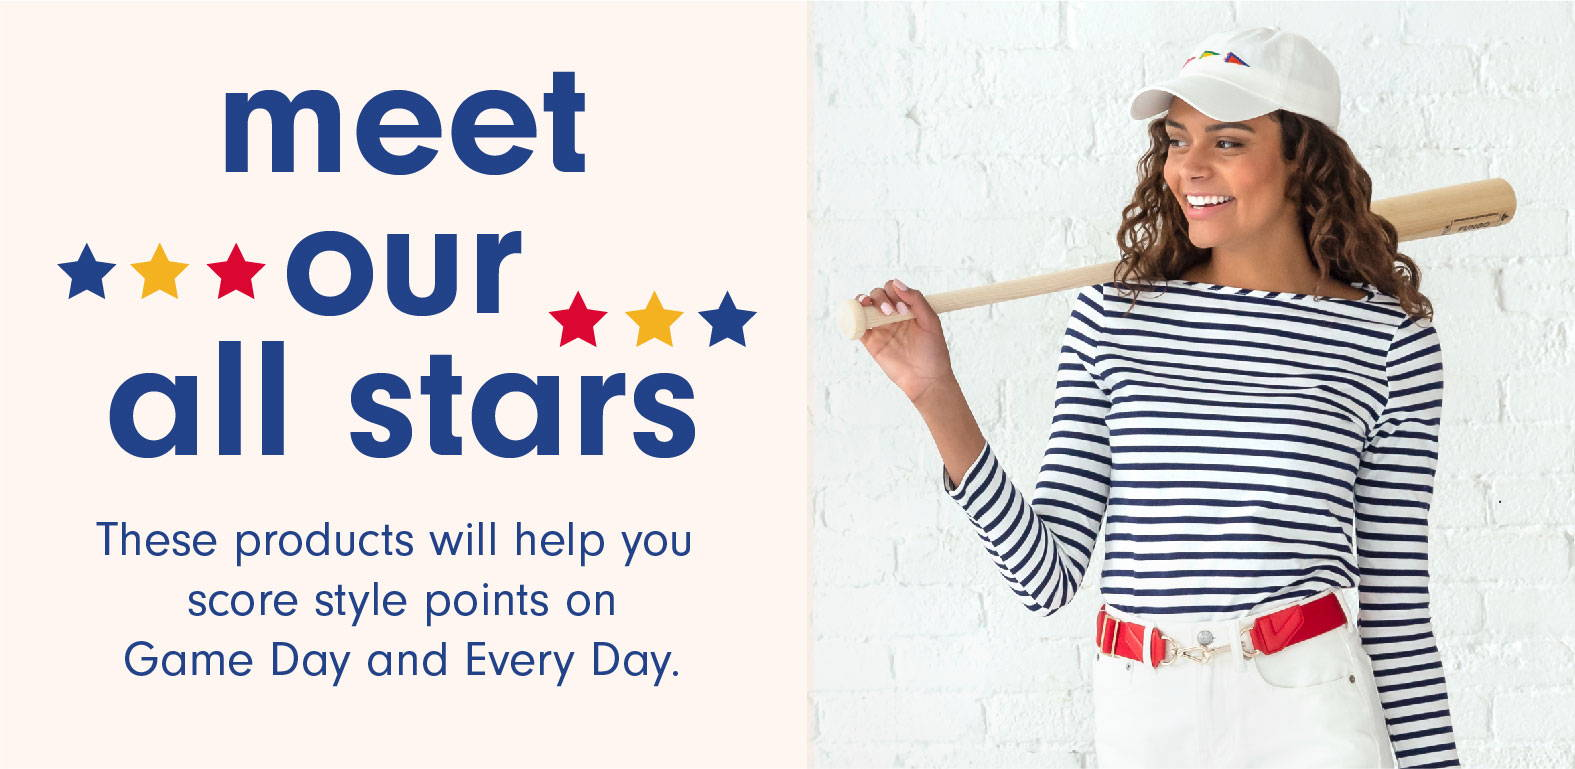 Meet our All Stars